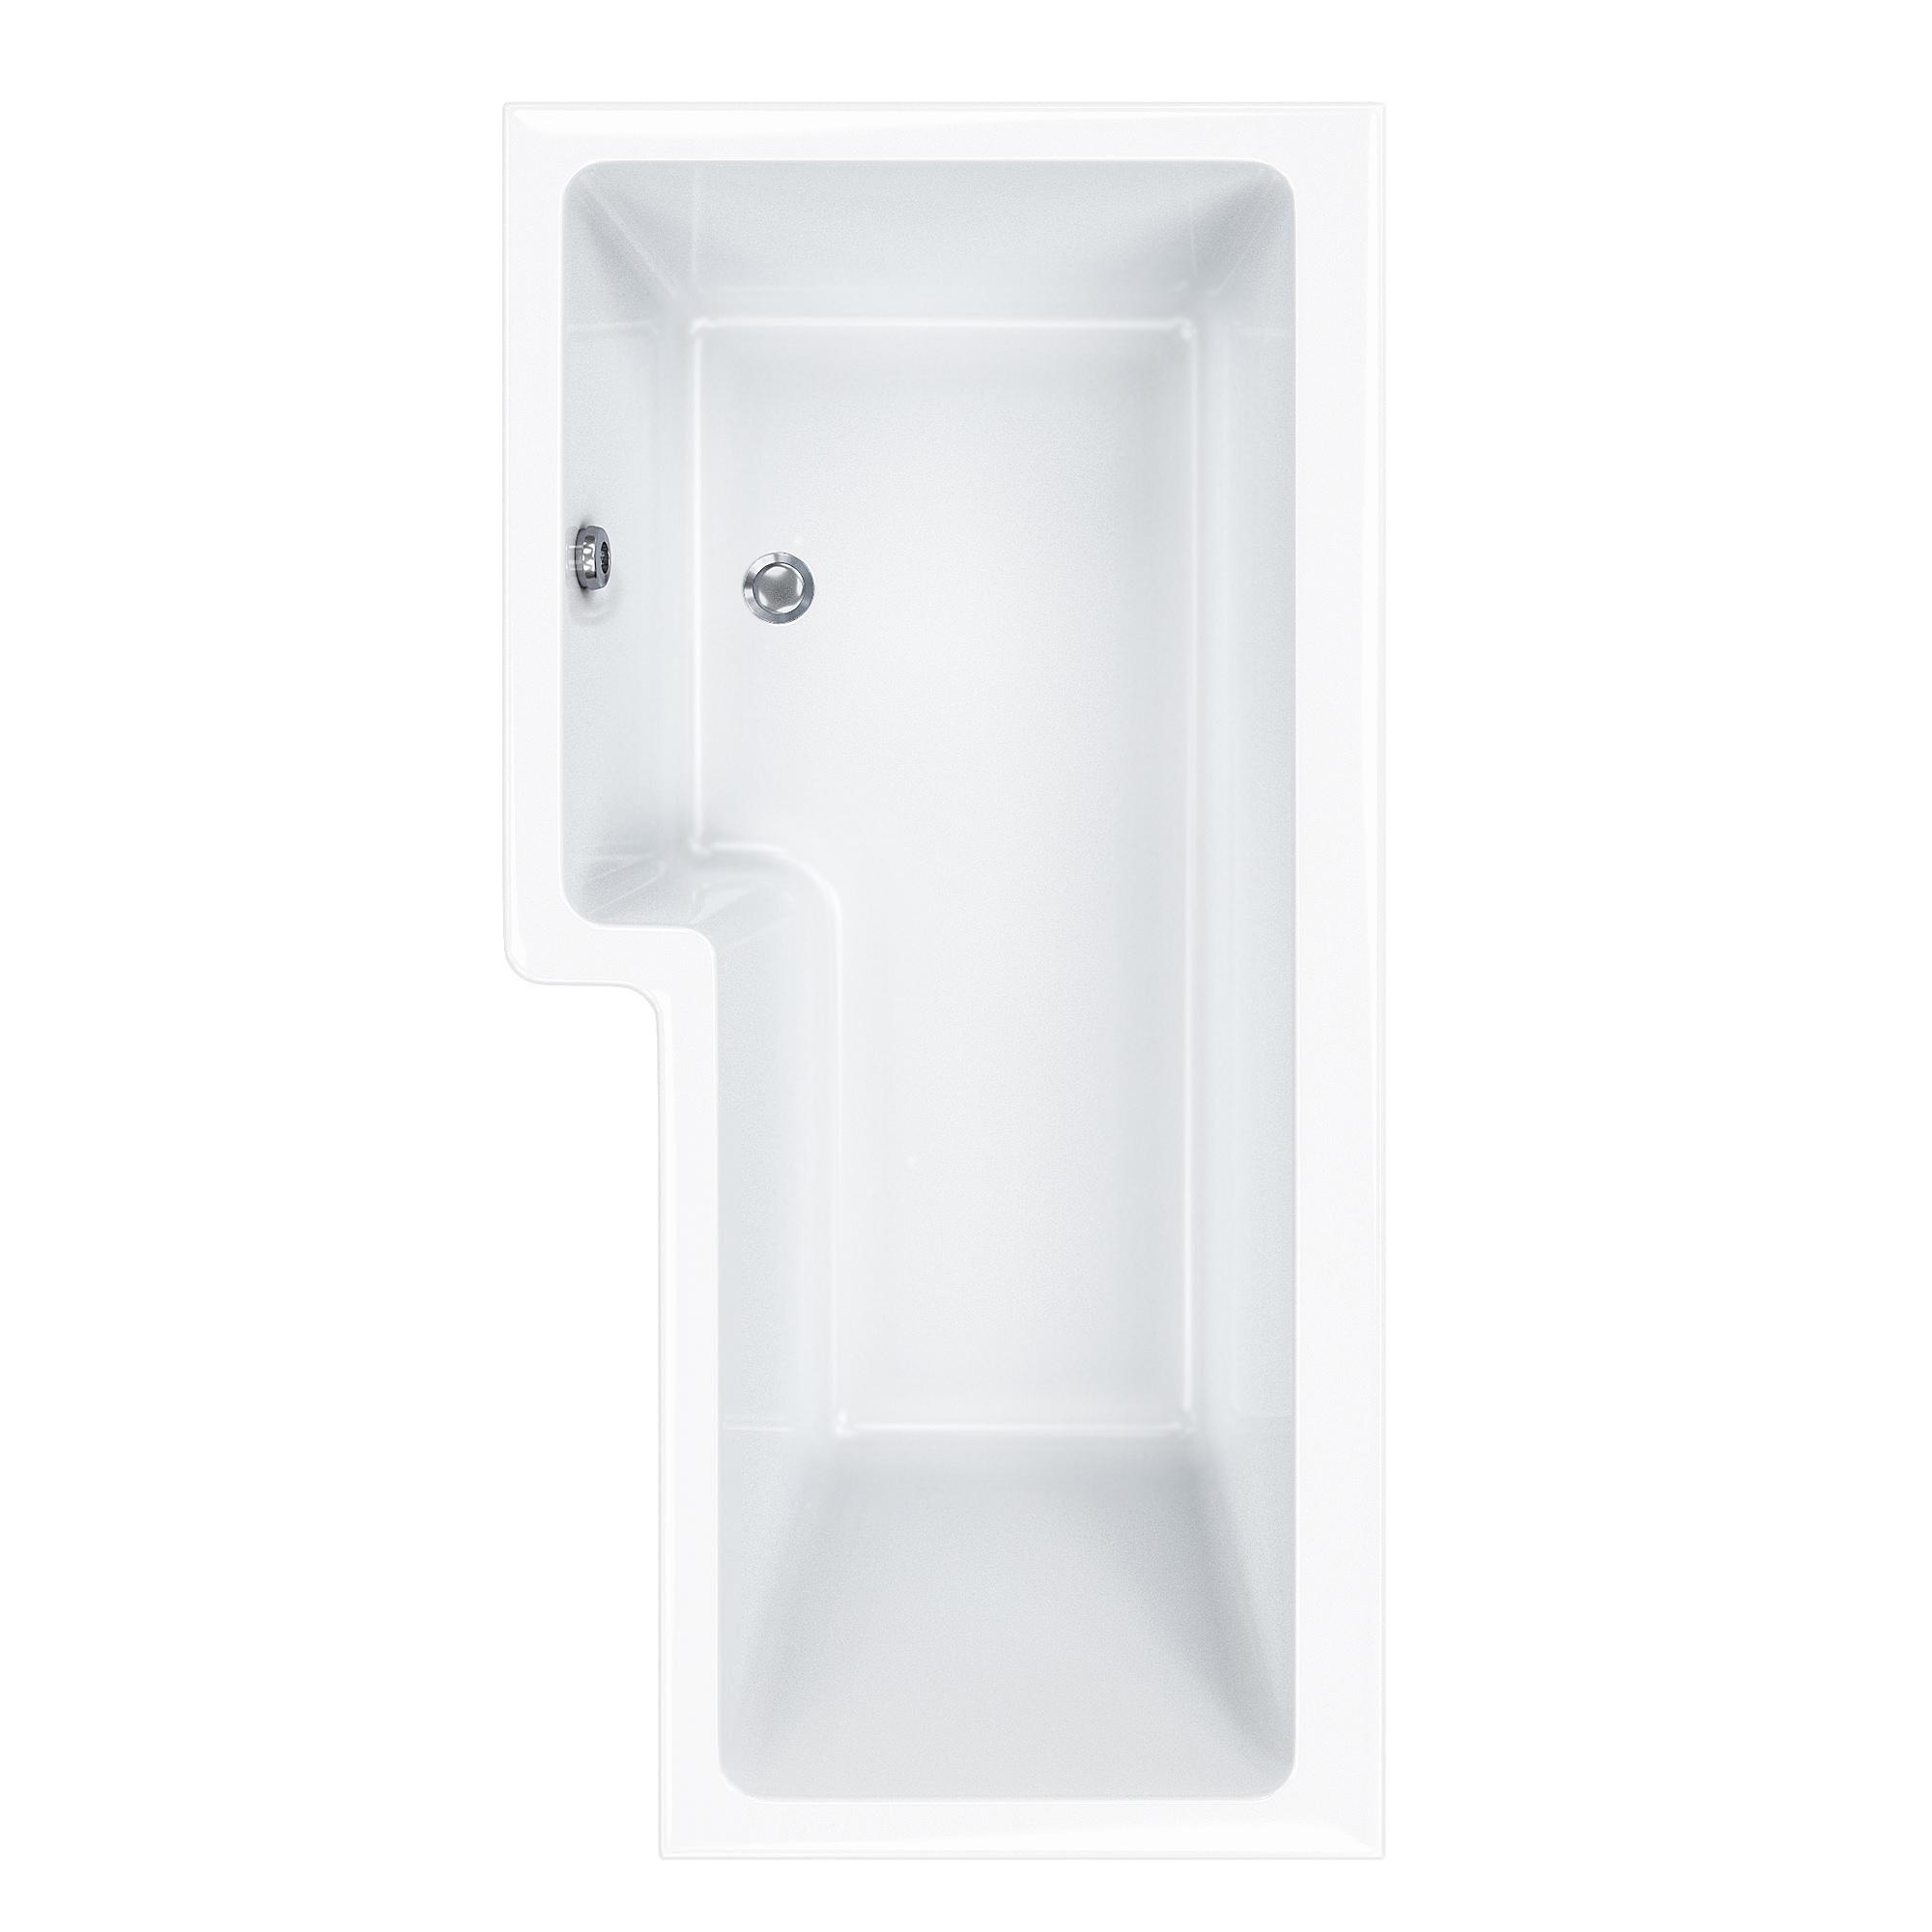 Carron Quantum 5mm Acrylic Square Shower Bath 1700 x 850mm LH